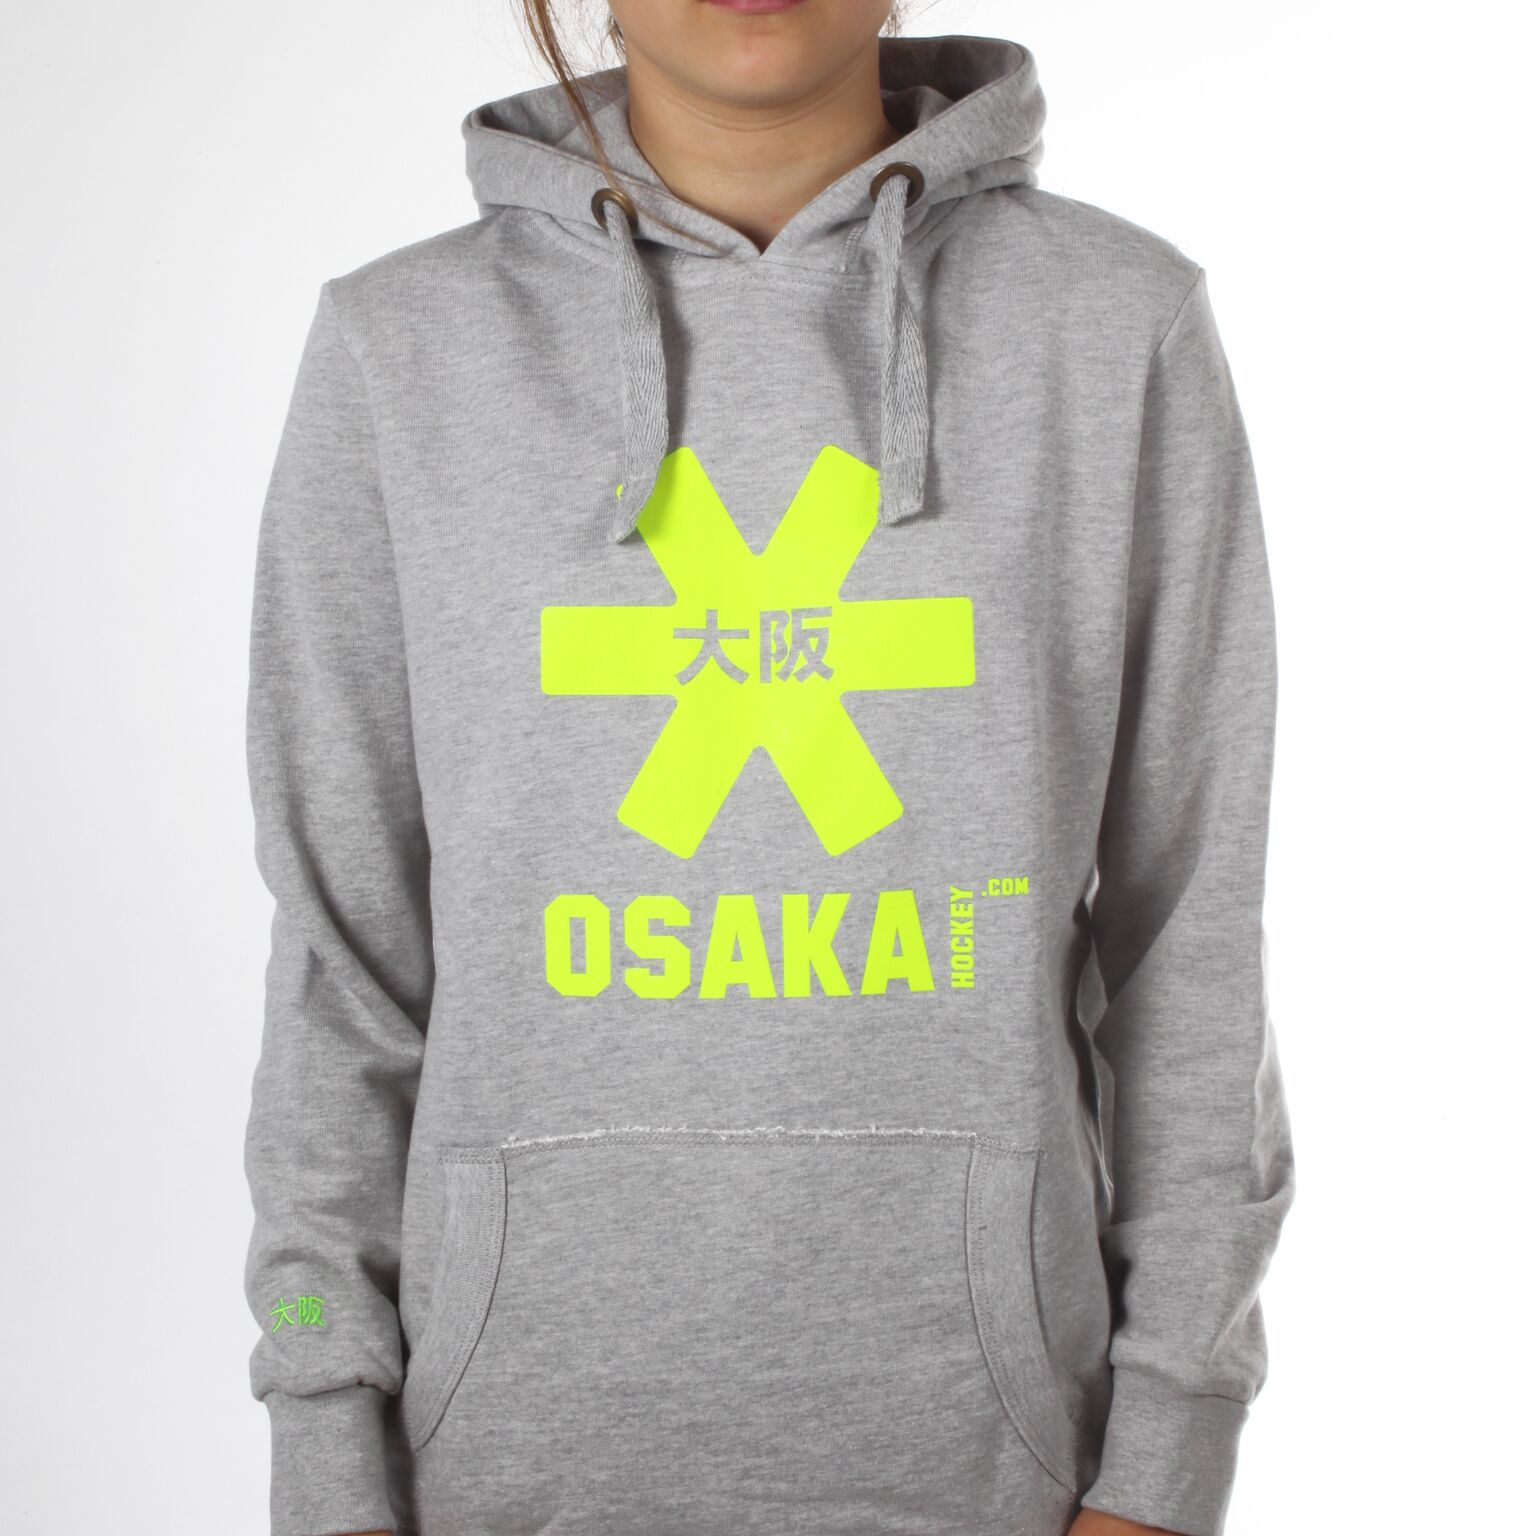 Osaka hoodie kids GELE STER